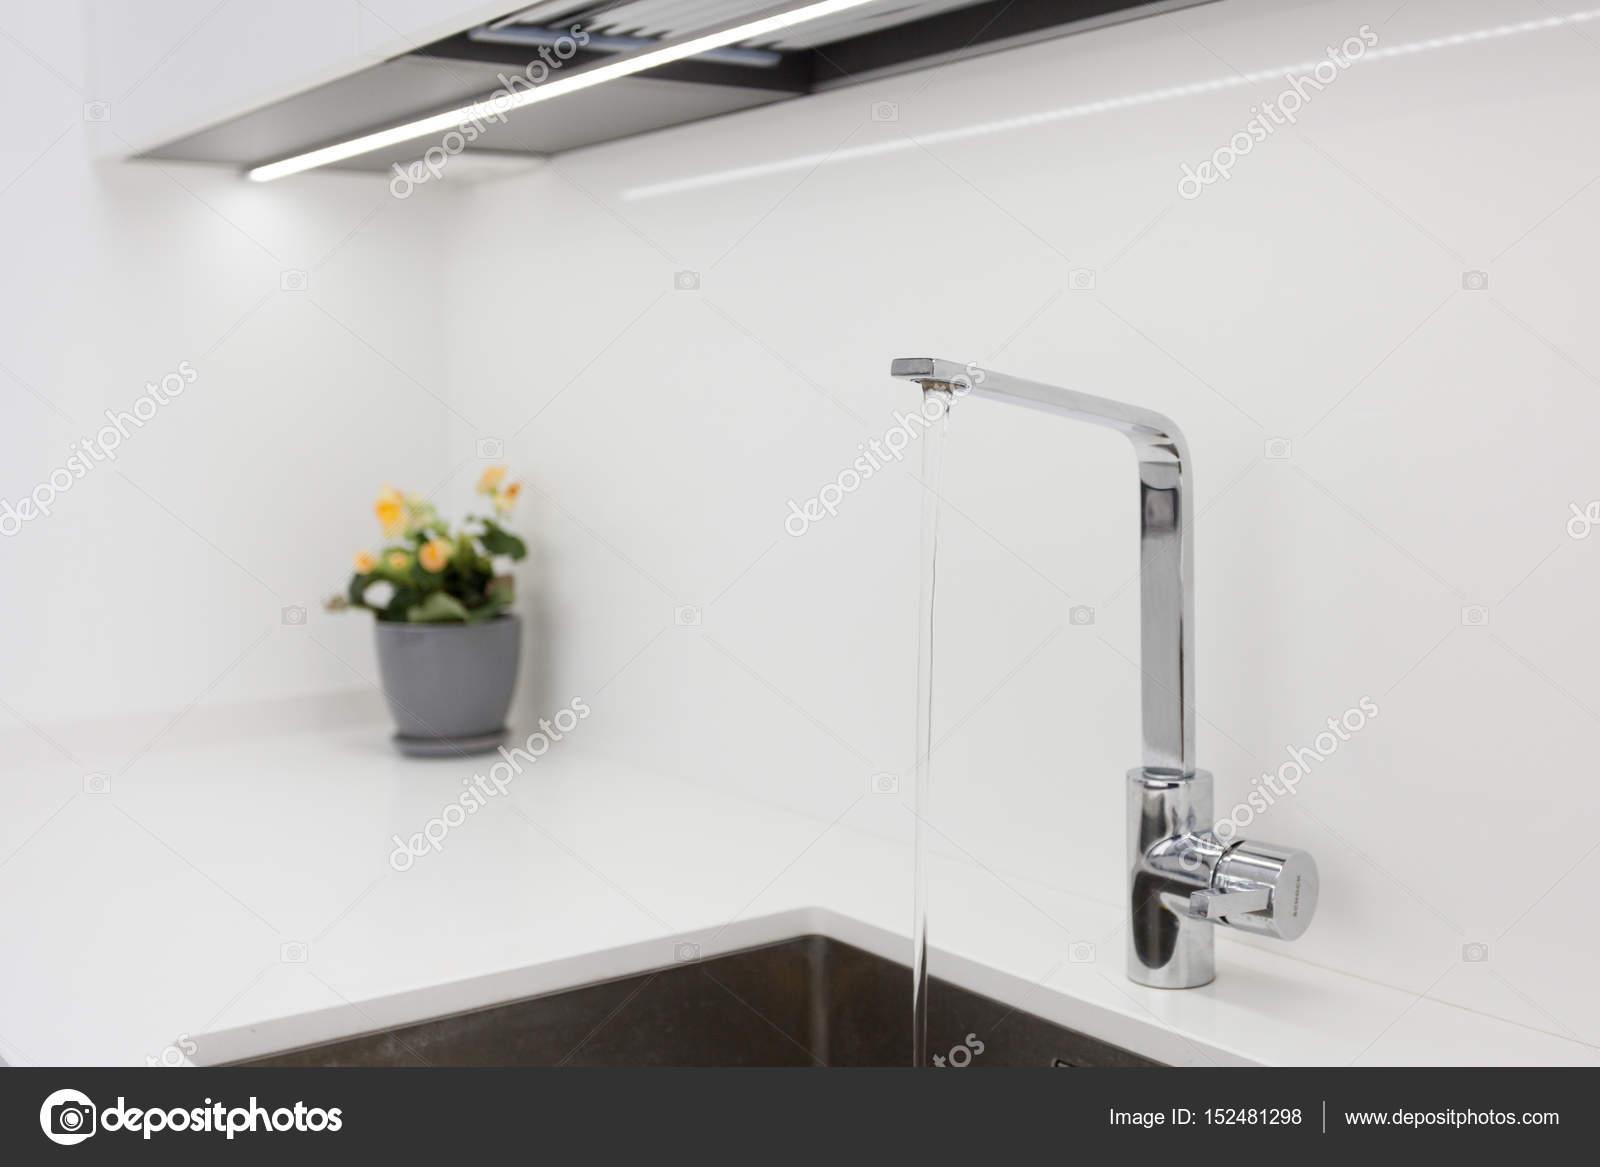 Golpecito de agua cromo de diseño moderno sobre el fregadero de ...